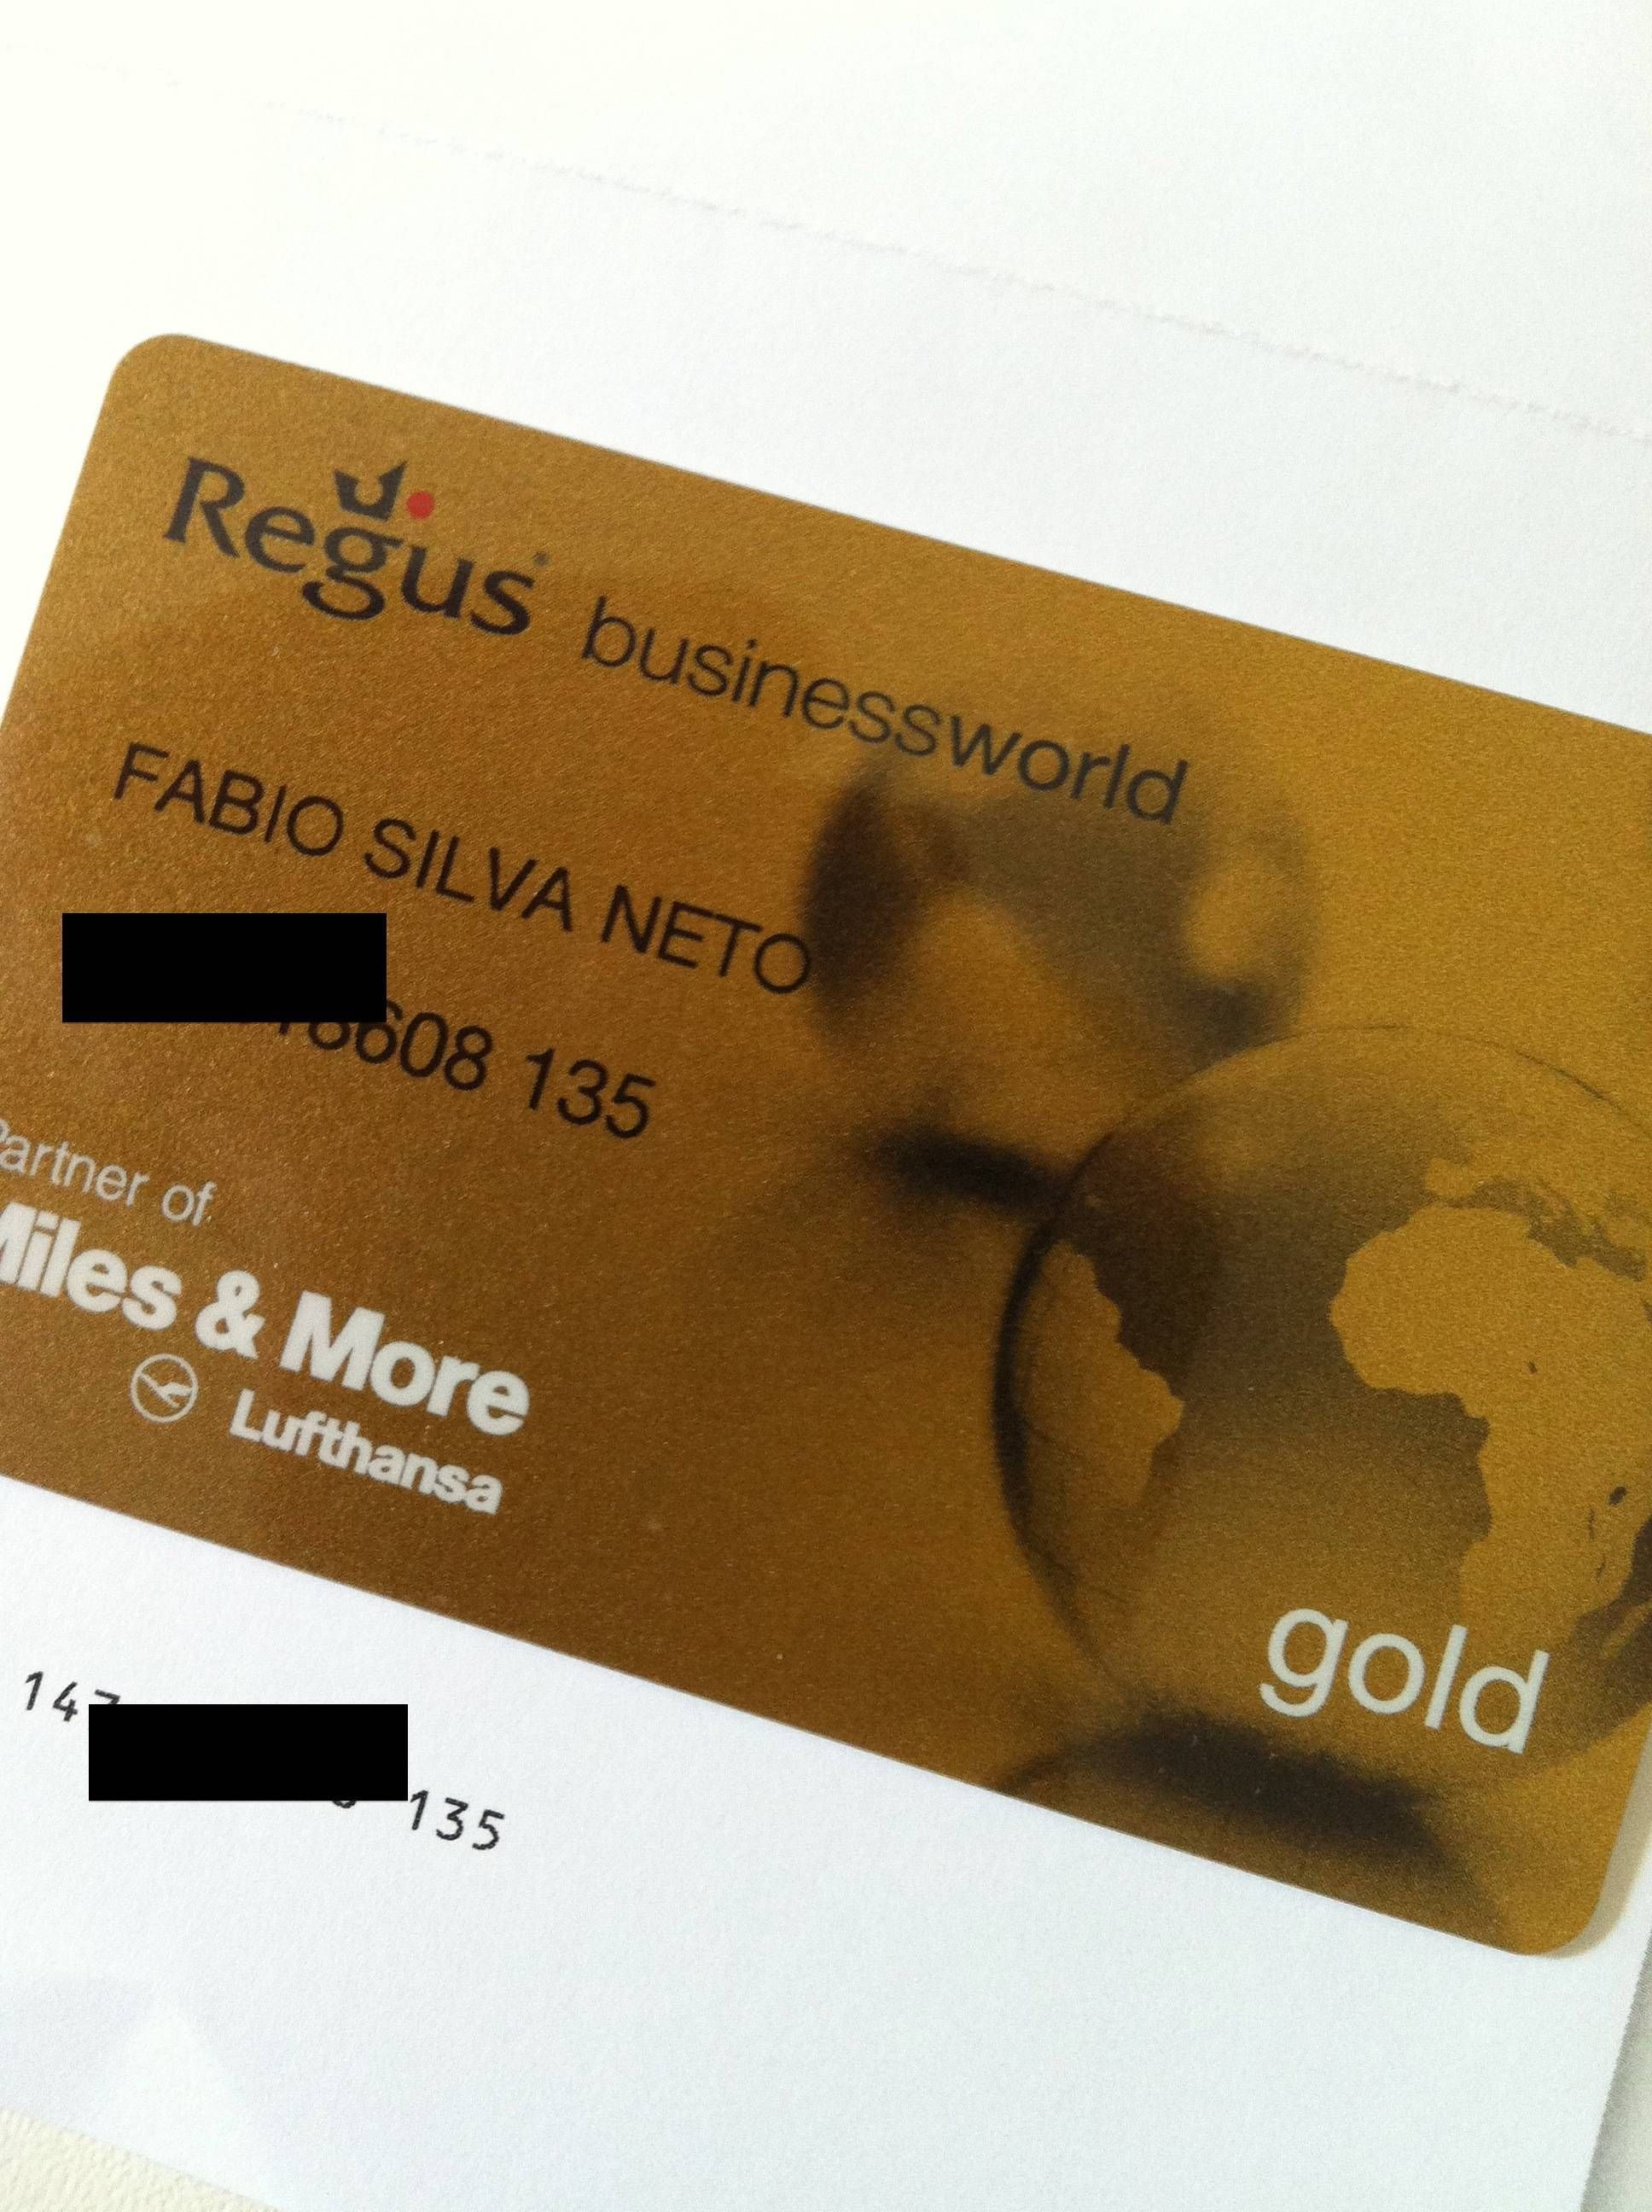 Regus Businessworld Gold